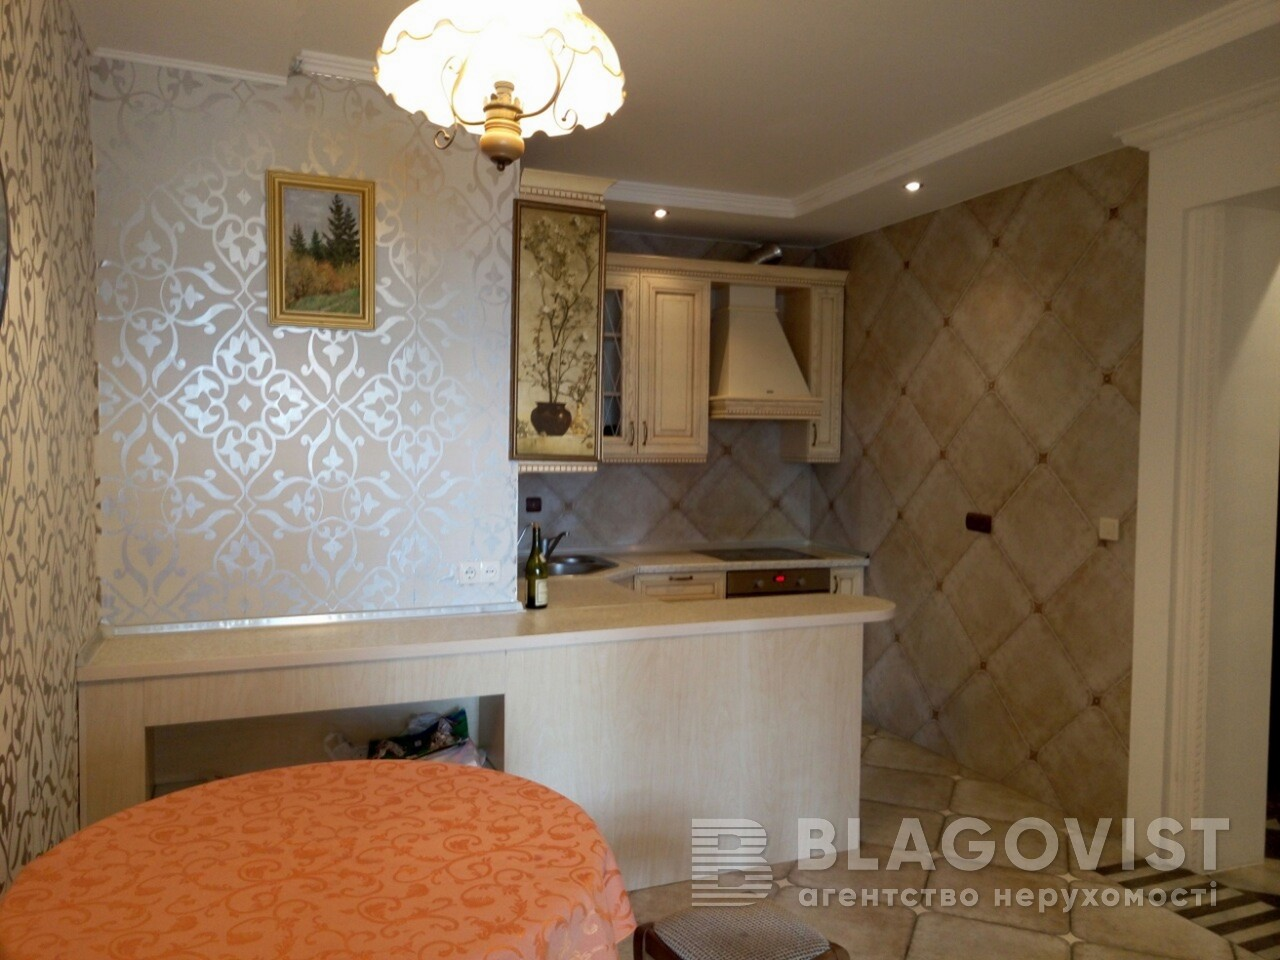 Квартира C-90891, Львовская, 22а, Киев - Фото 12